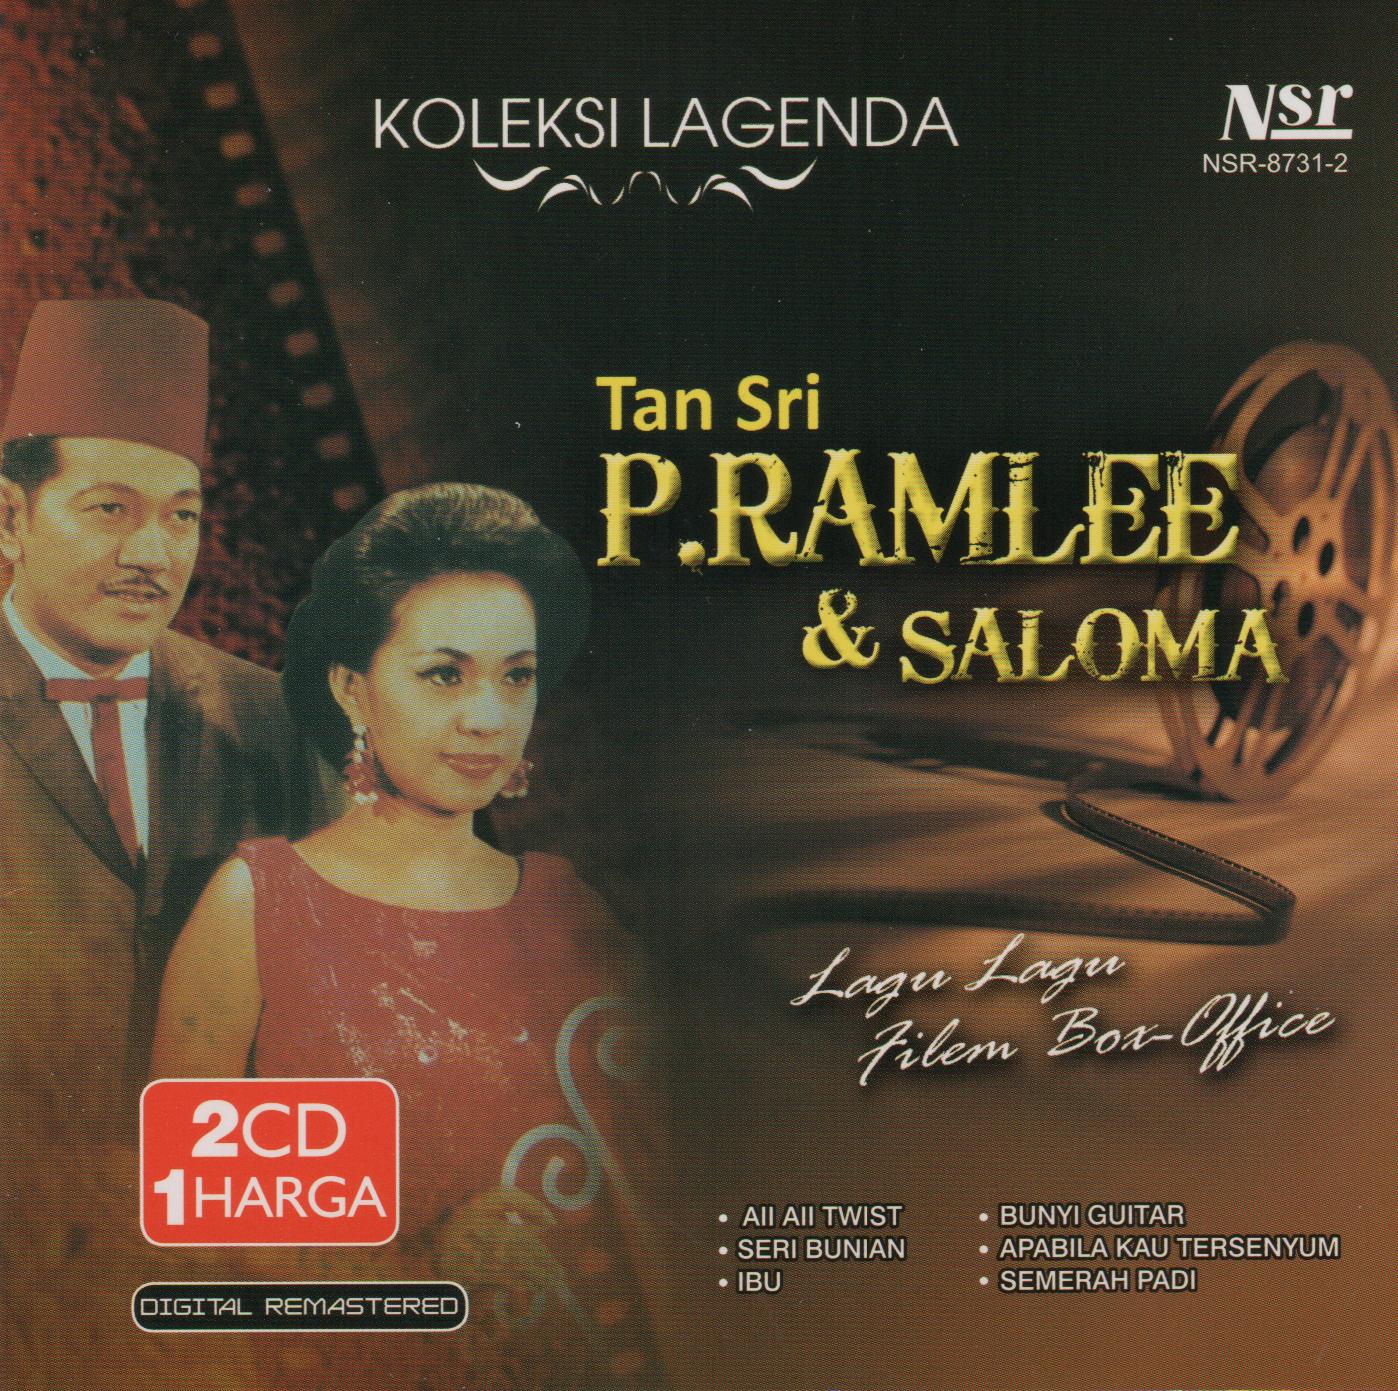 Download Lagu Thank You Nex: Bodega Pop: P. Ramlee & Saloma